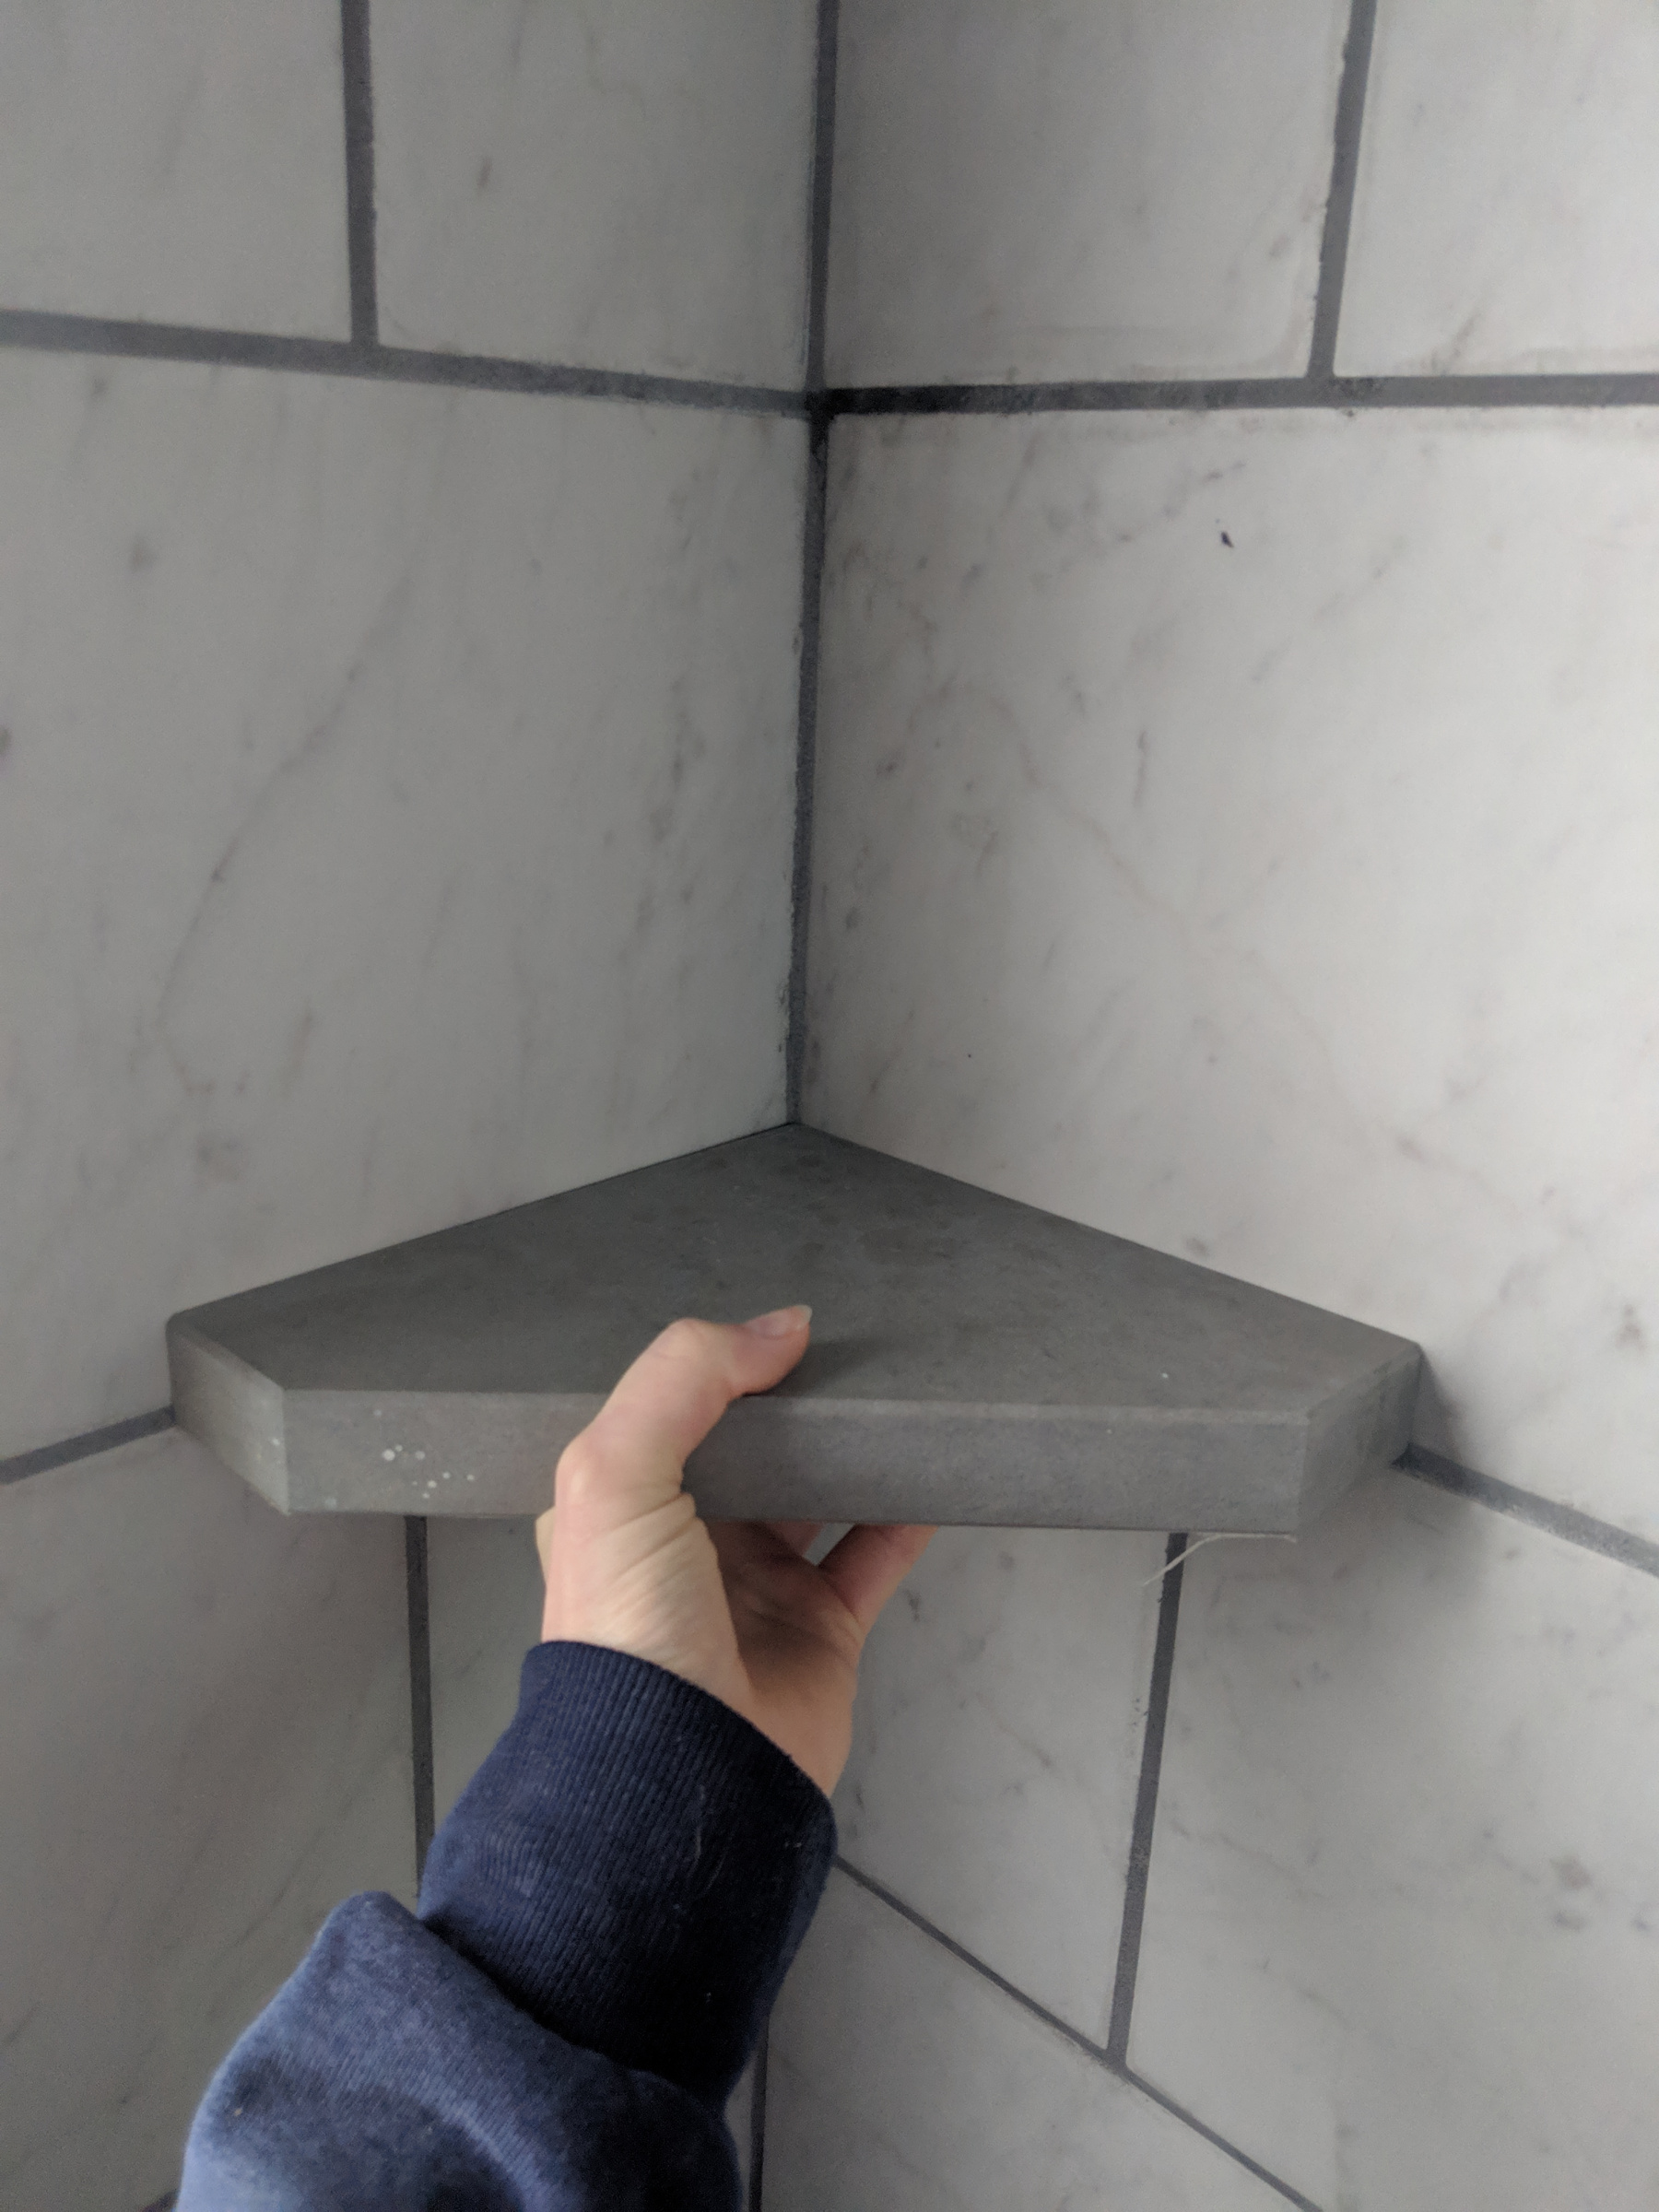 retrofit shower corner shelf-img_20190507_134233.jpg